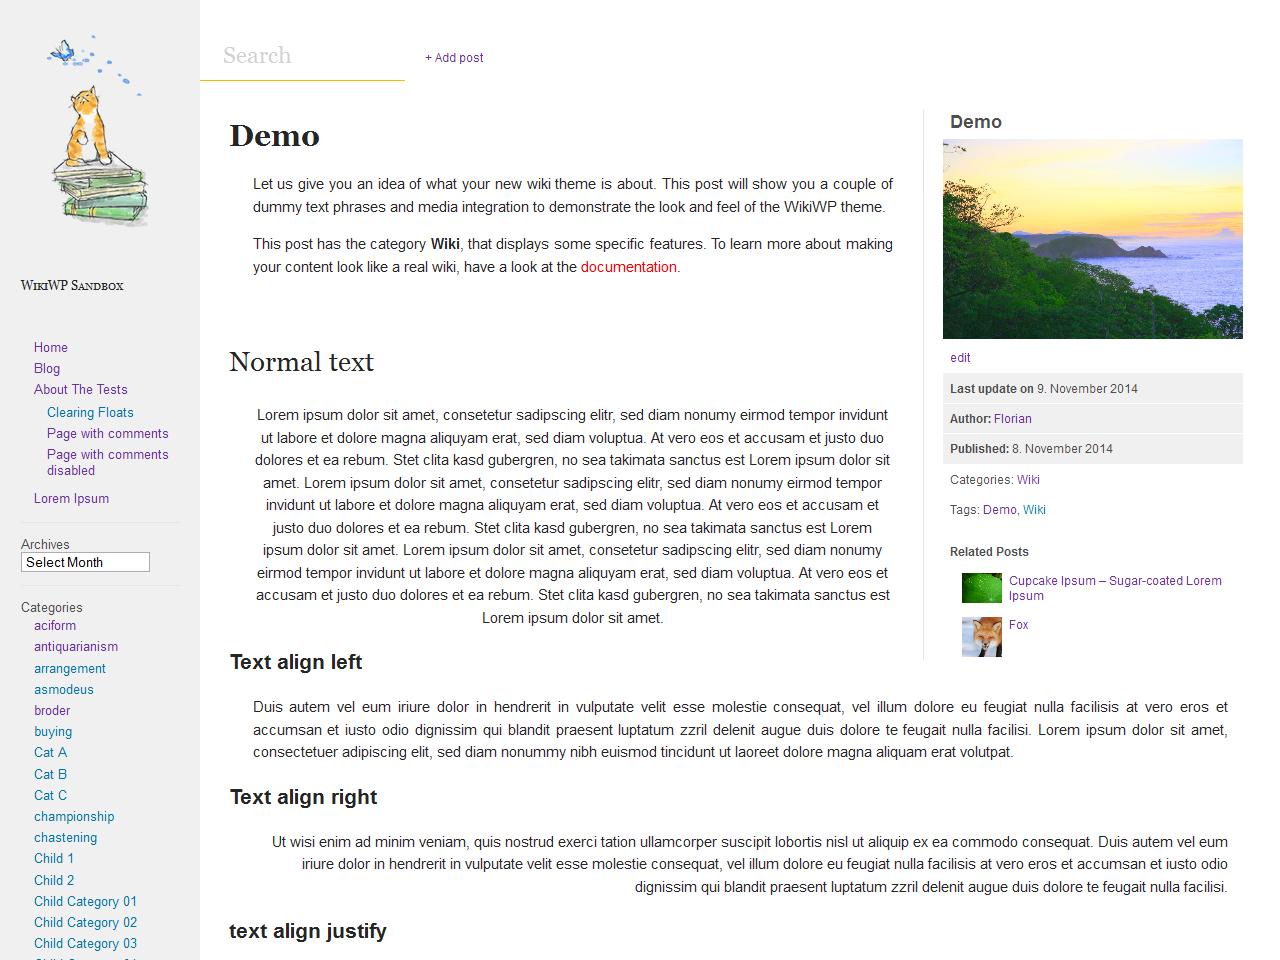 https://themes.svn.wordpress.org/wikiwp/1.4.6/screenshot.png